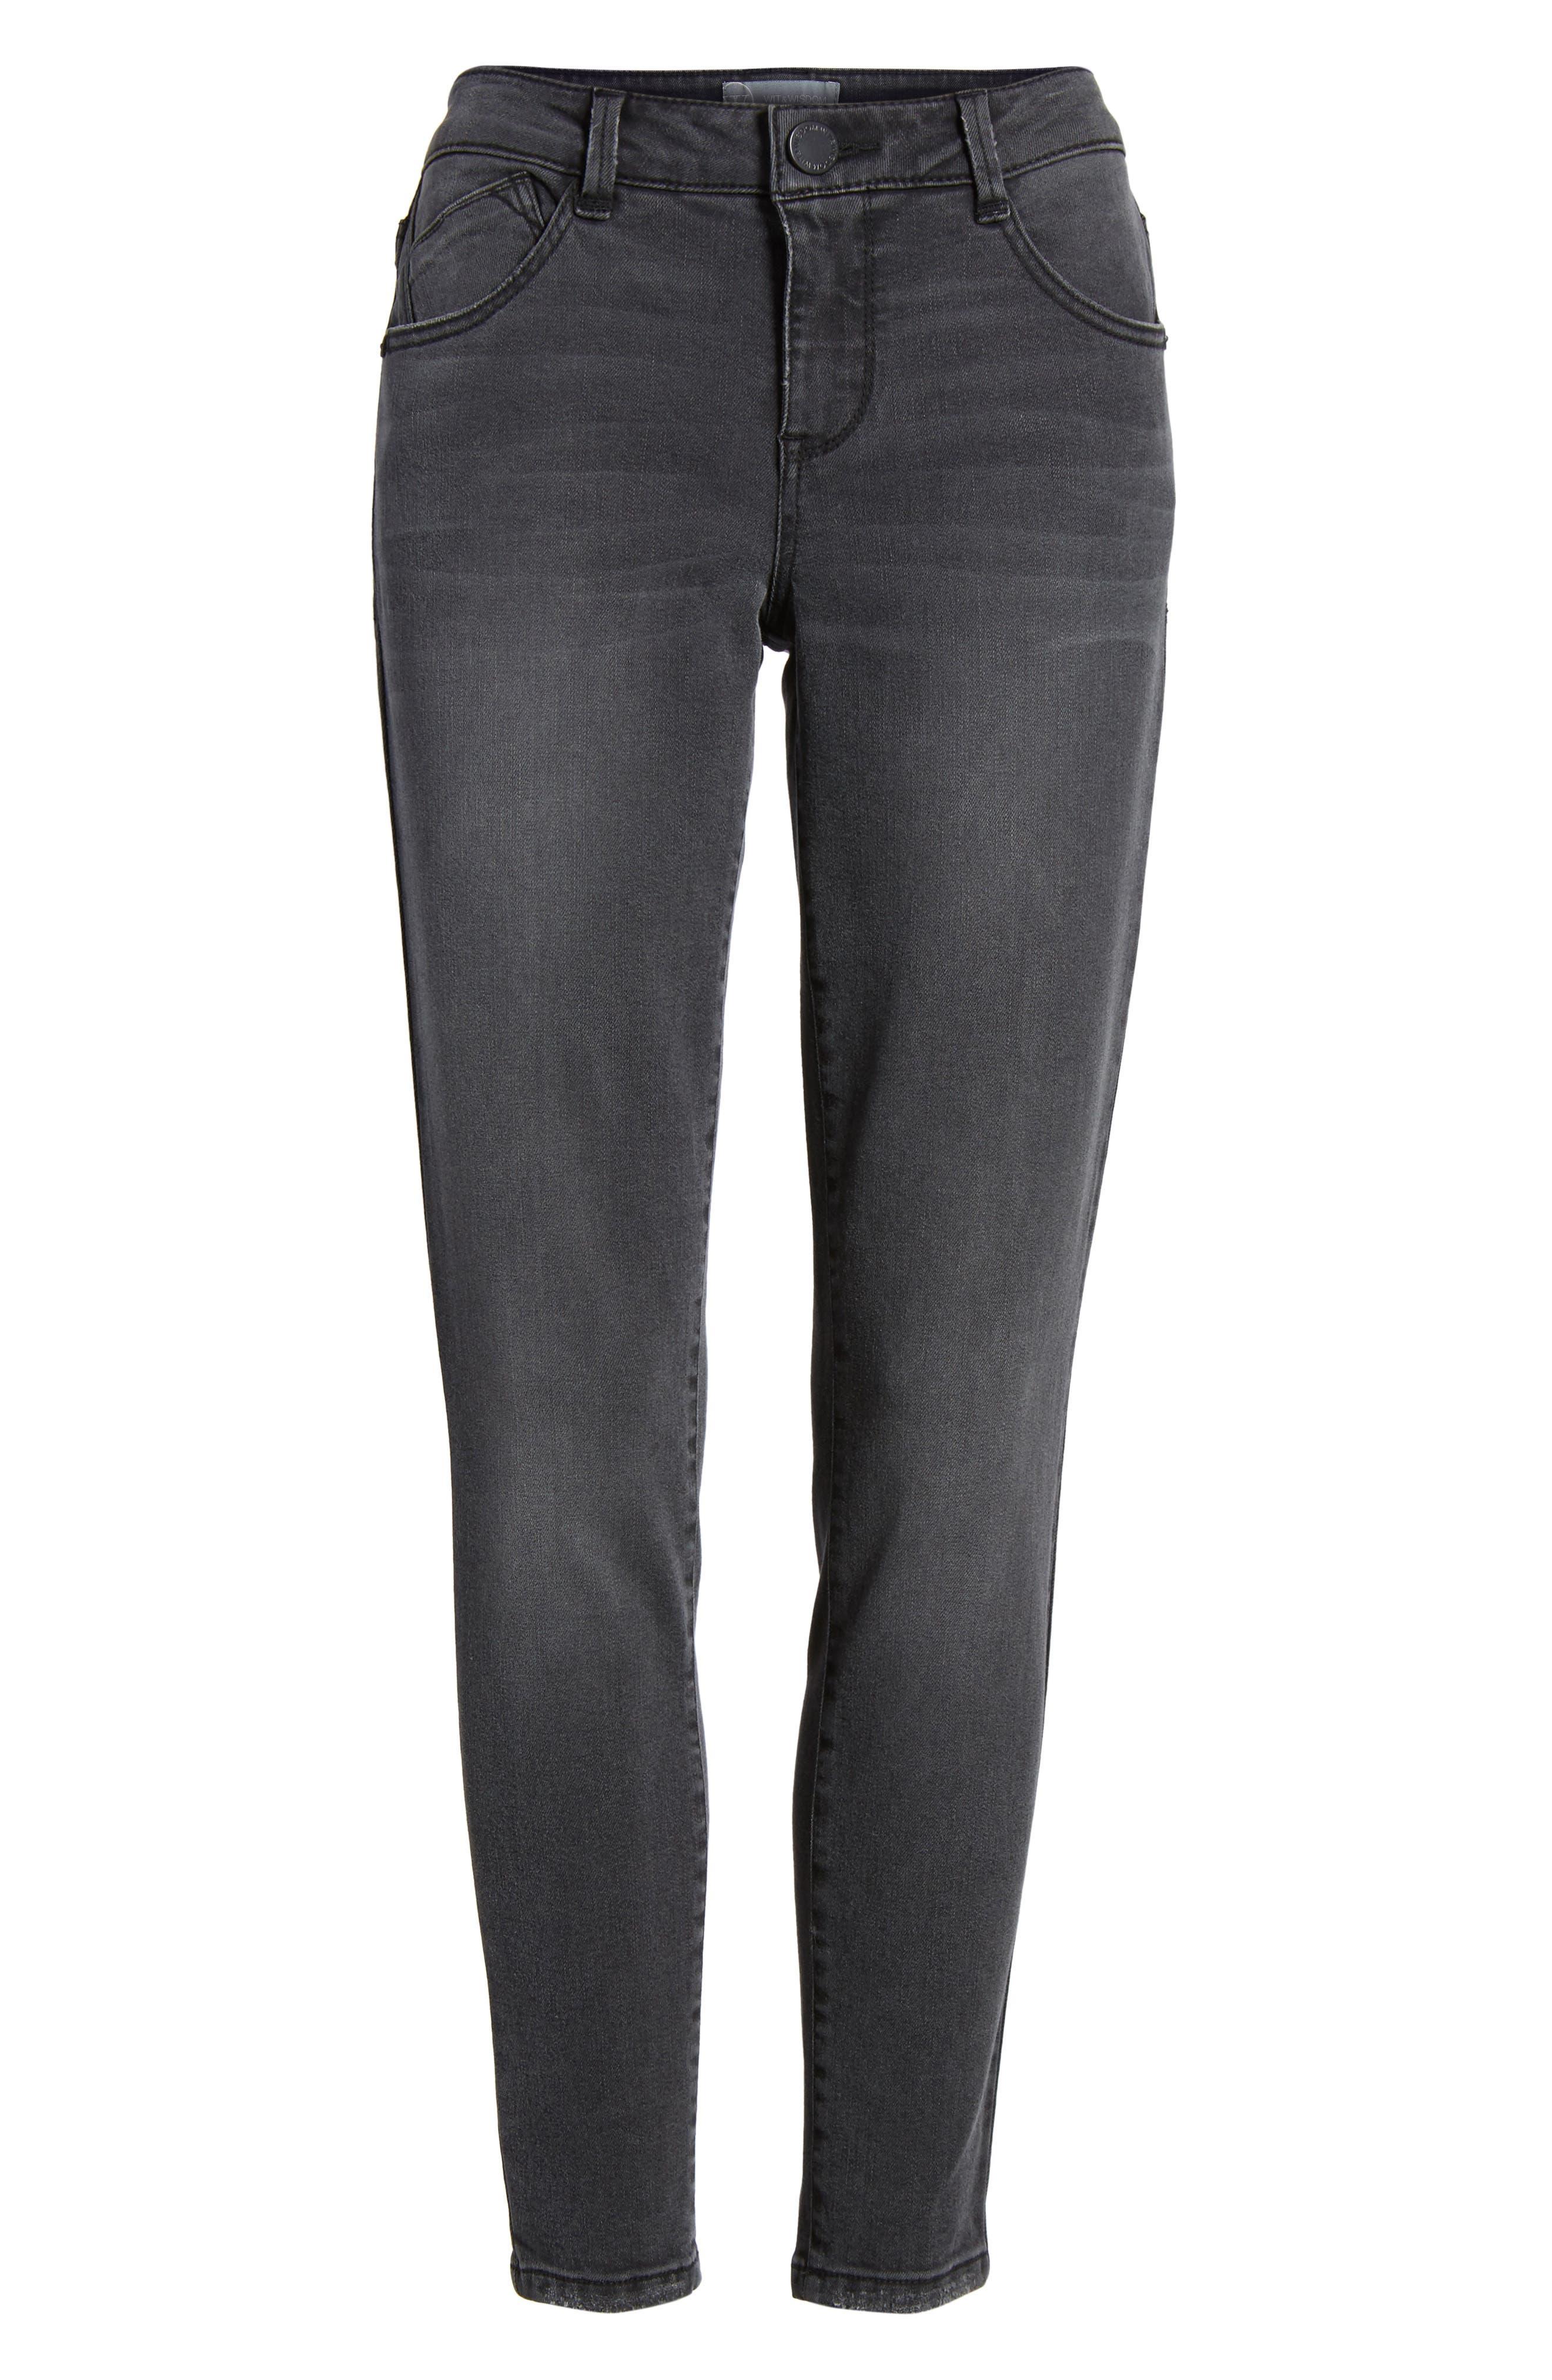 Skinny Ankle Jeans,                             Alternate thumbnail 7, color,                             020